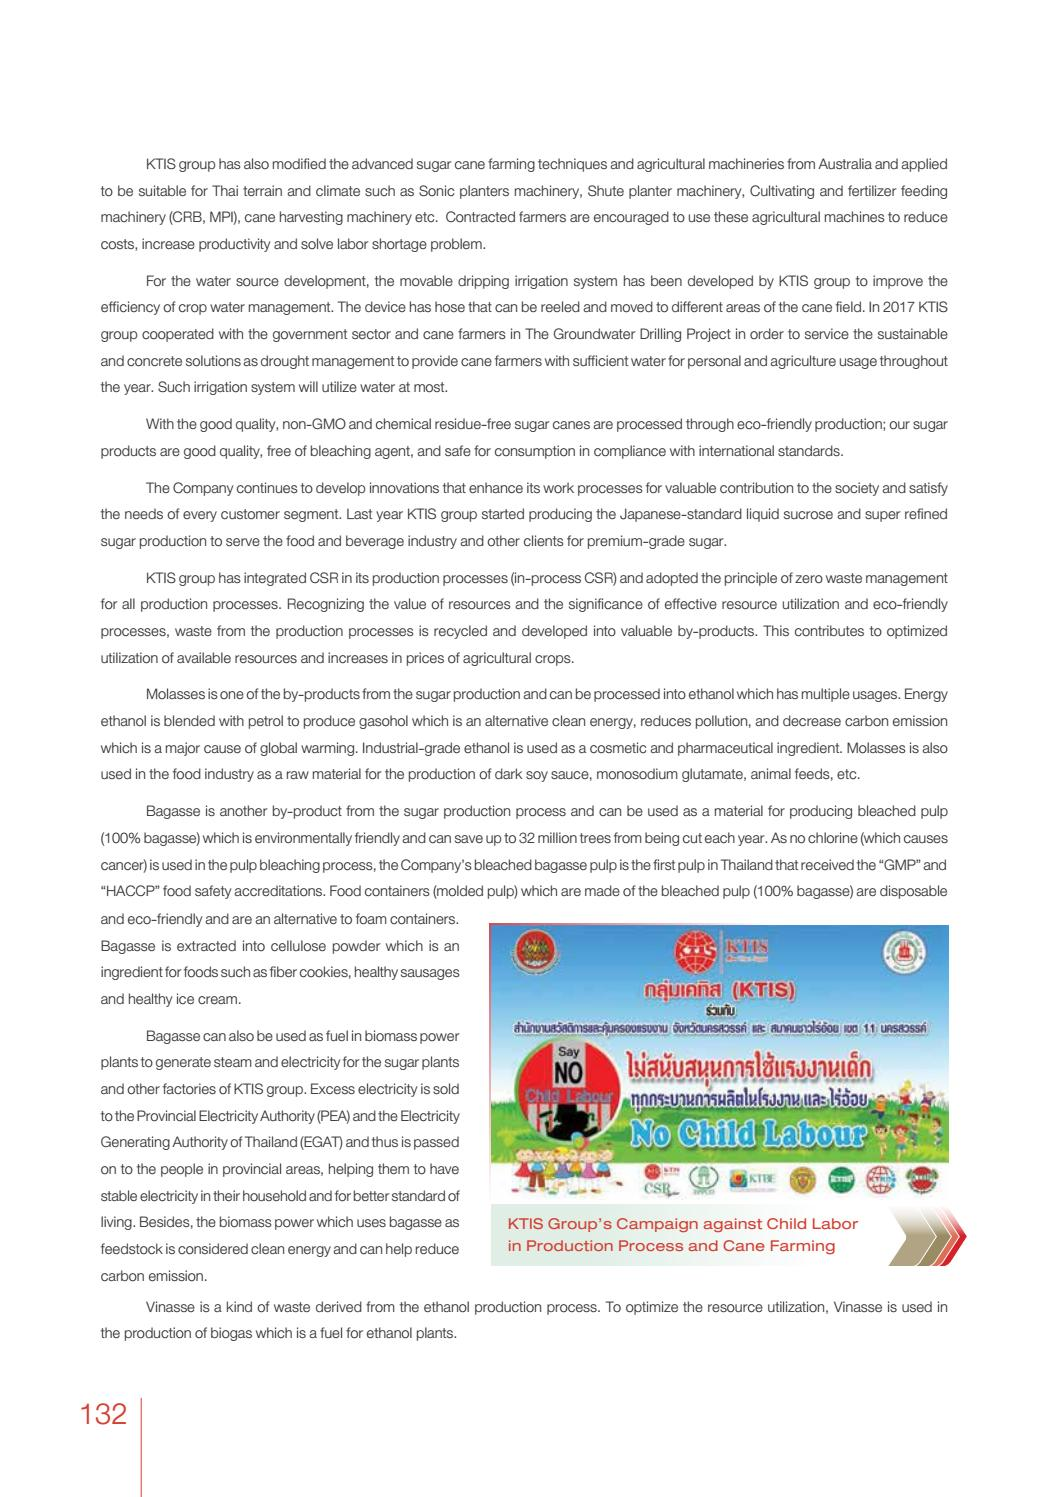 KTIS: Annual Report 2018 EN by Kaset Thai International Sugar